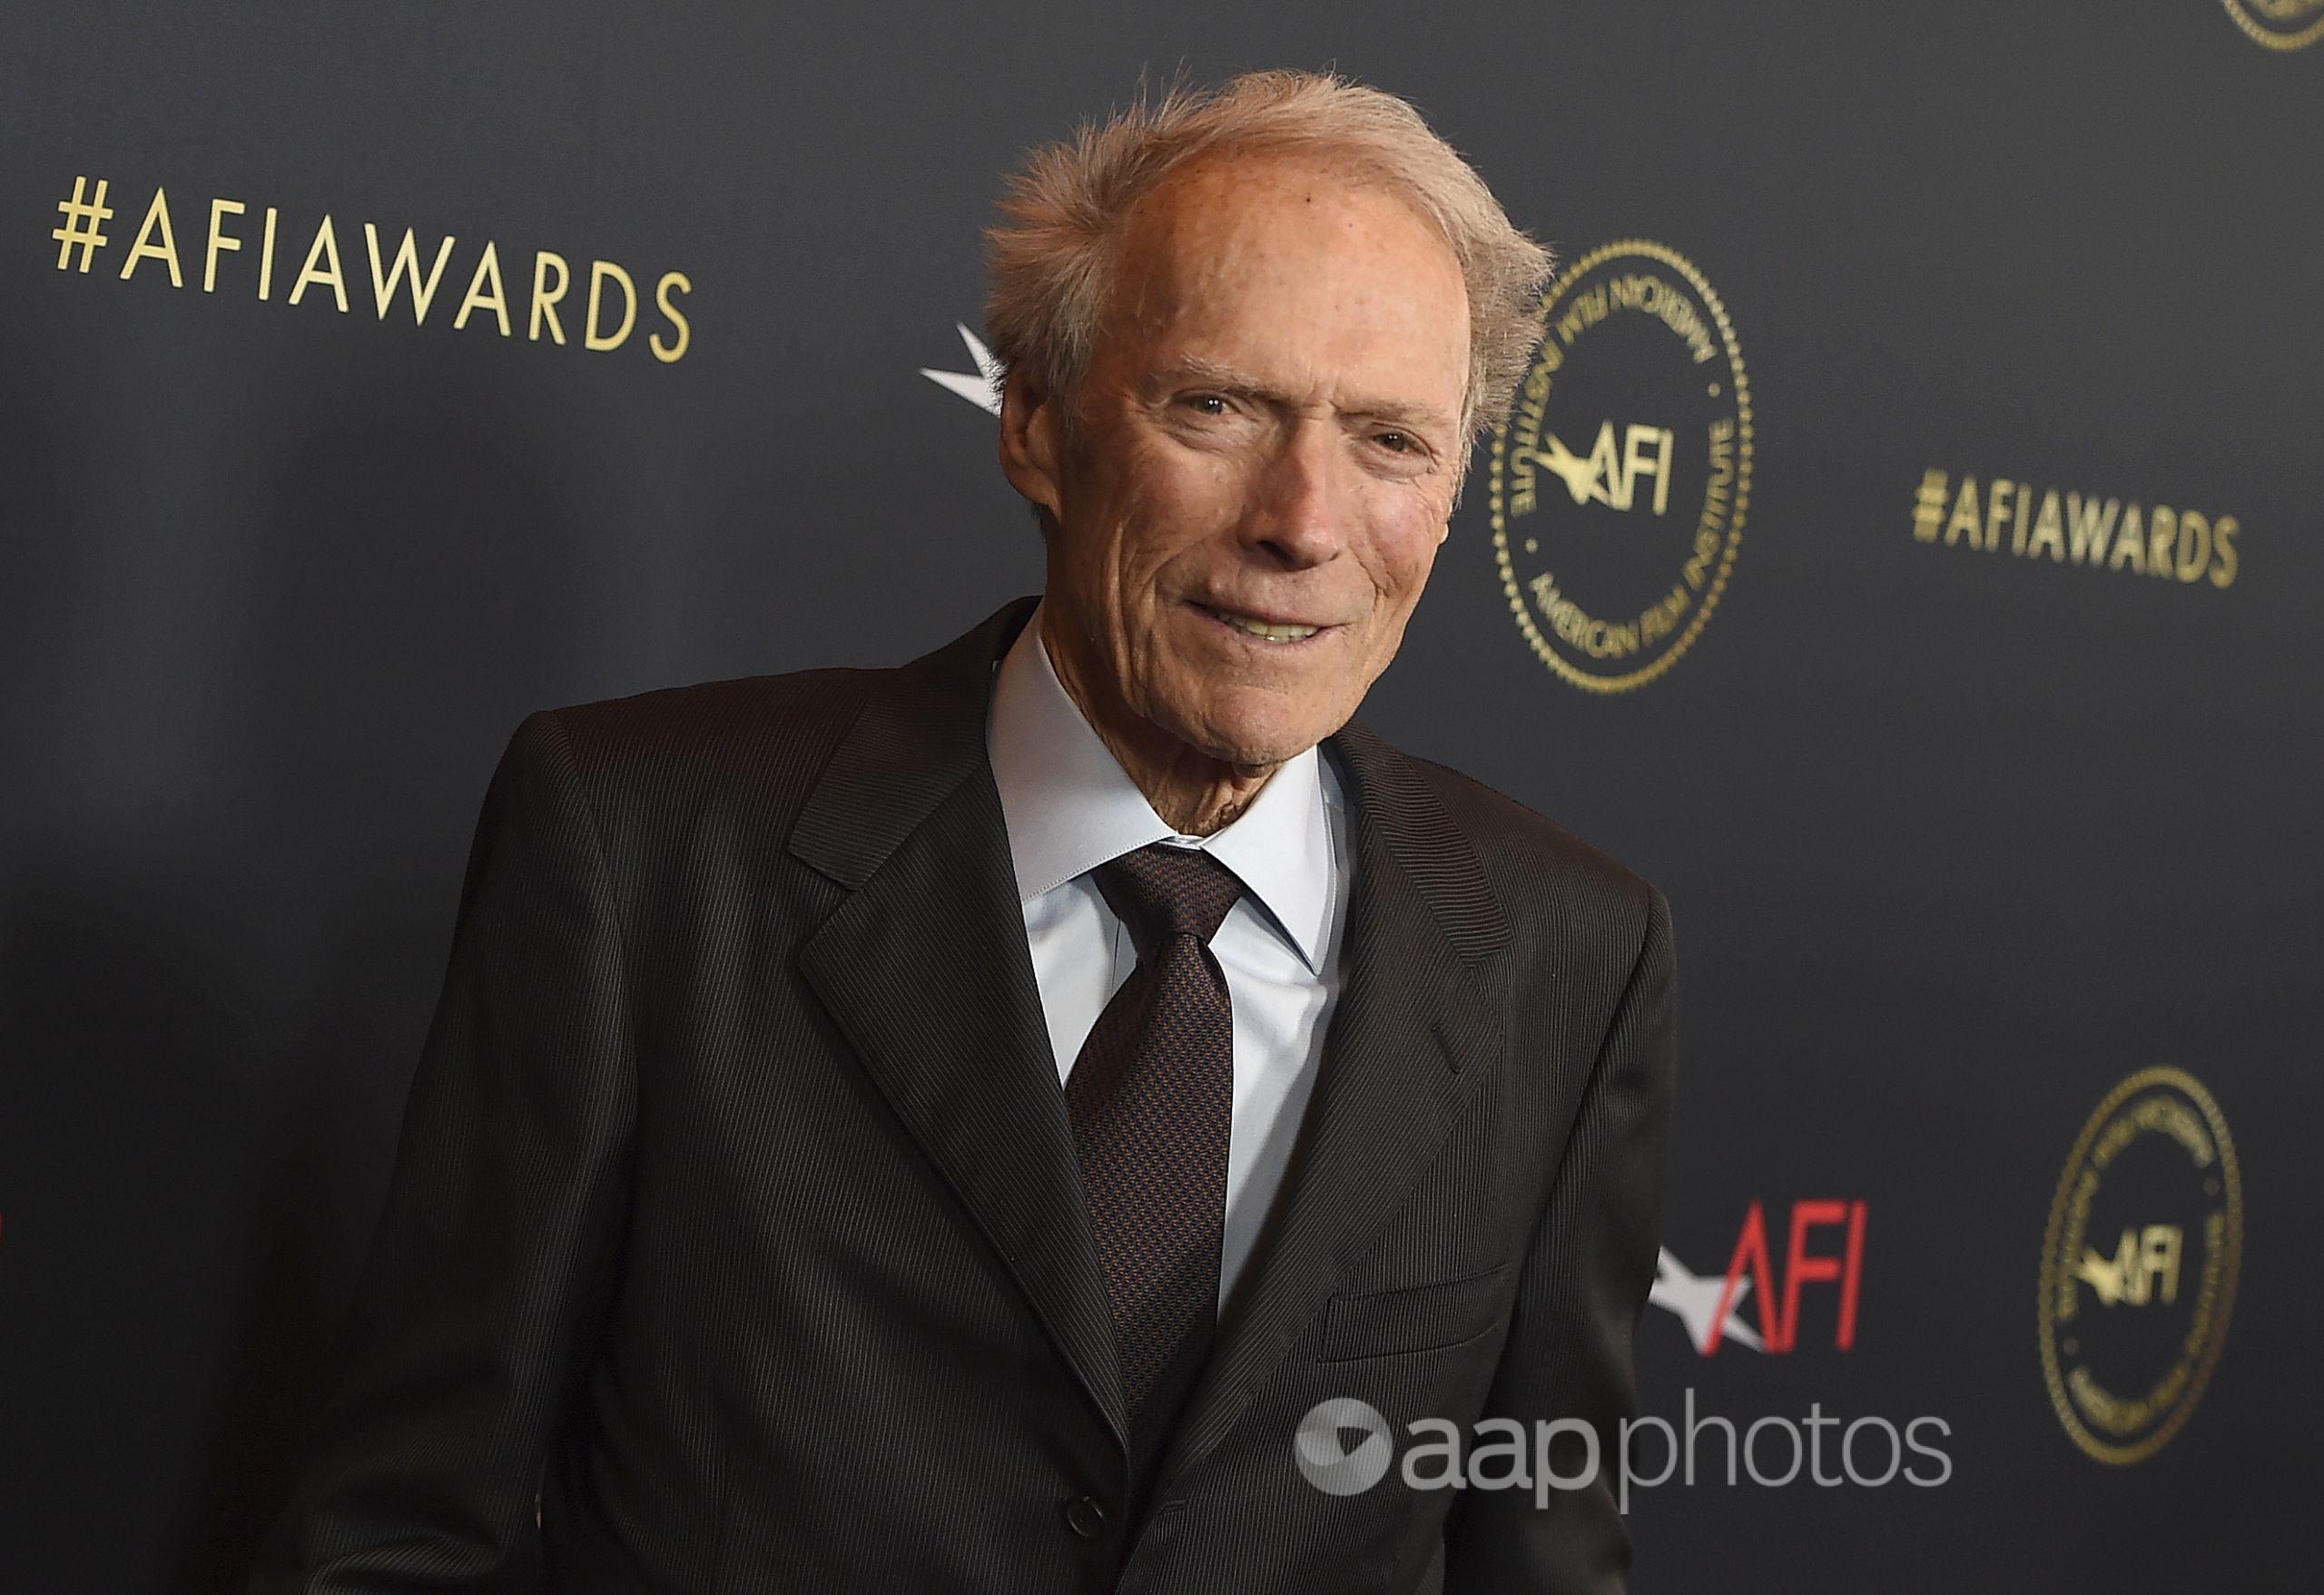 Hollywood veteran Clint Eastwood